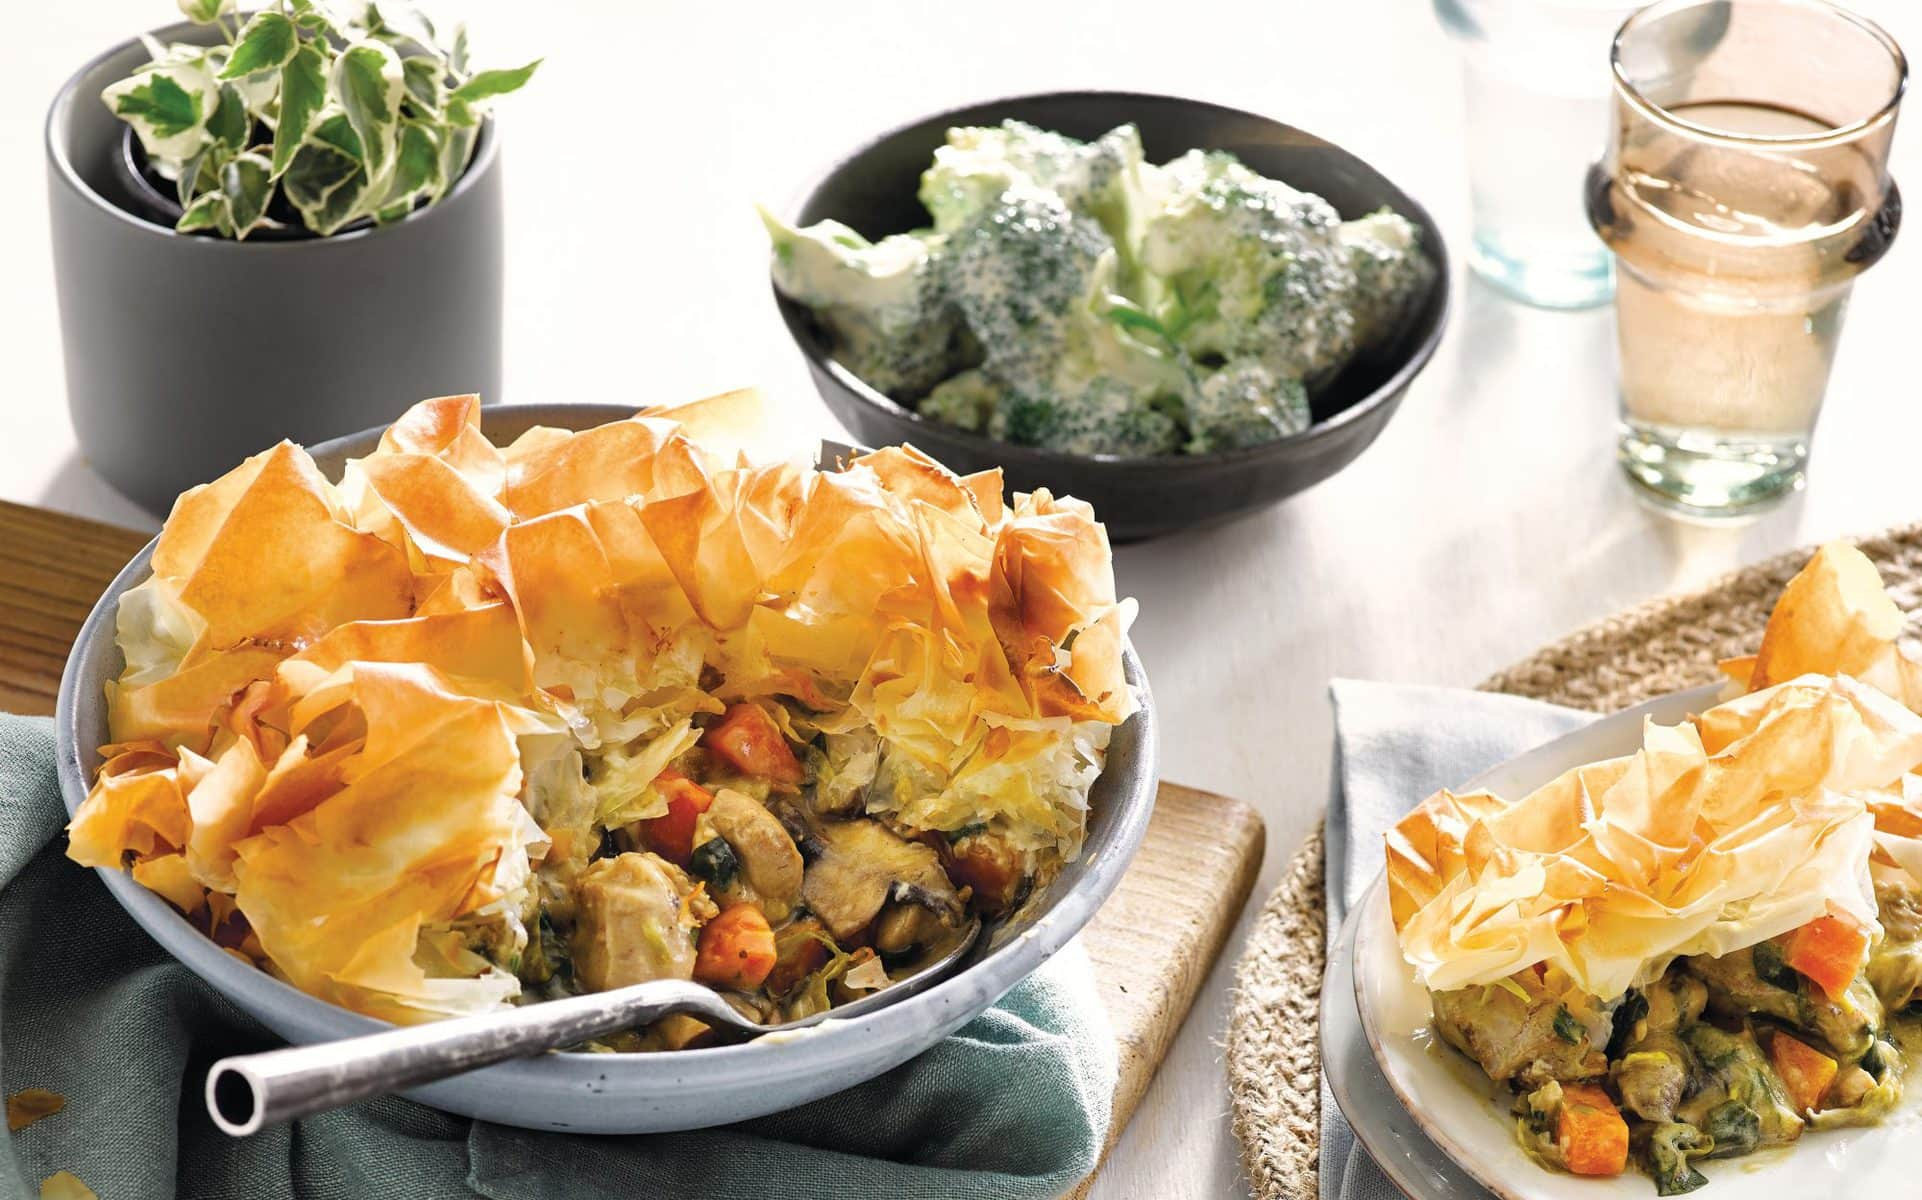 Chicken pot pie with creamy broccoli